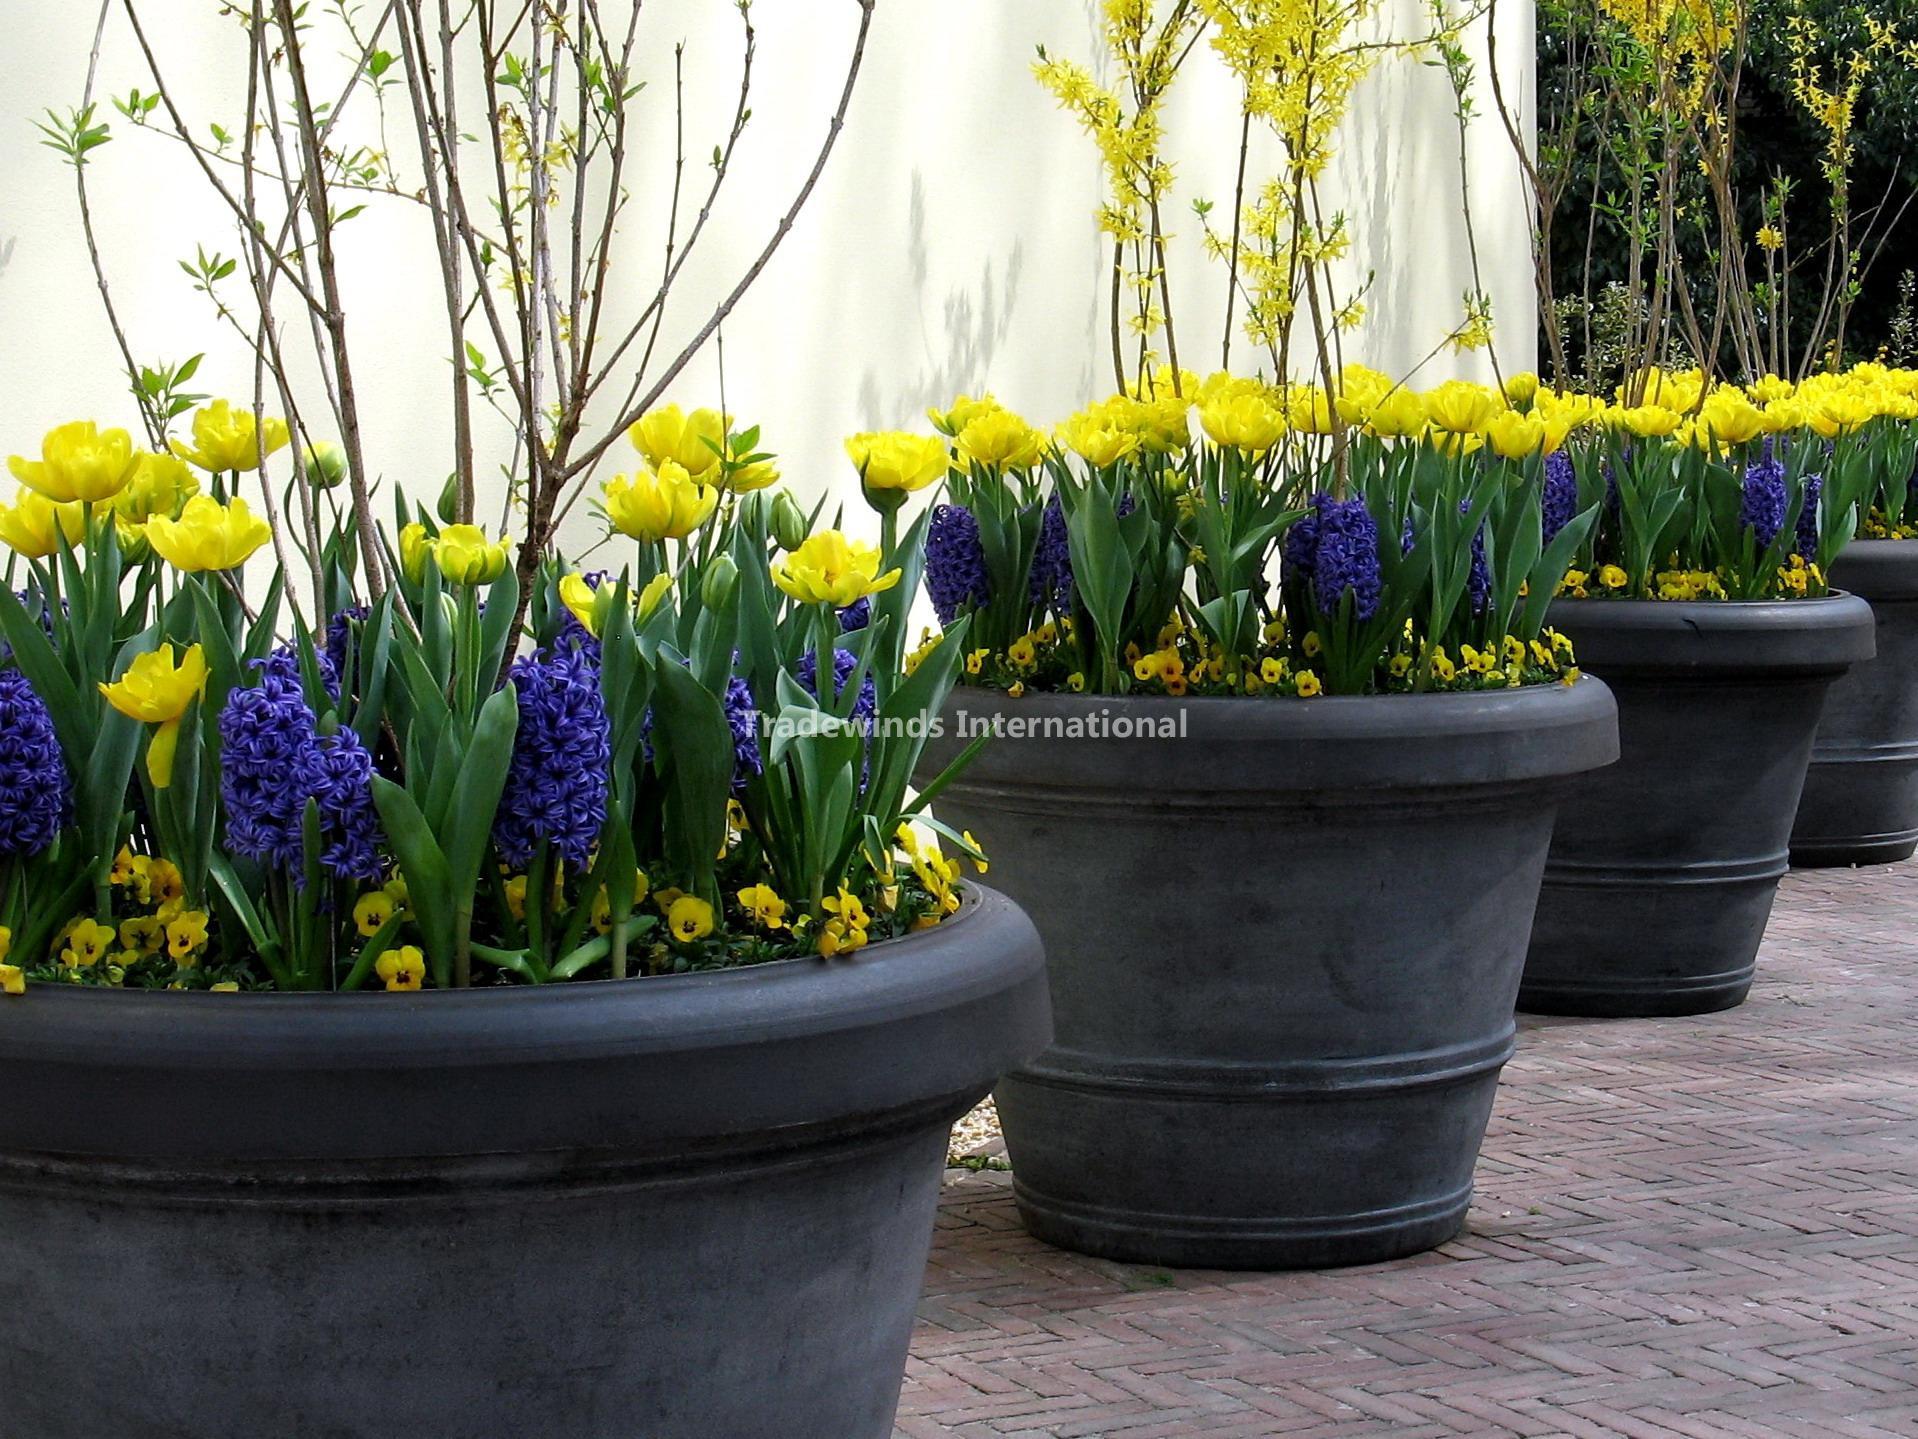 Potted Flower Bulbs Tradewinds International